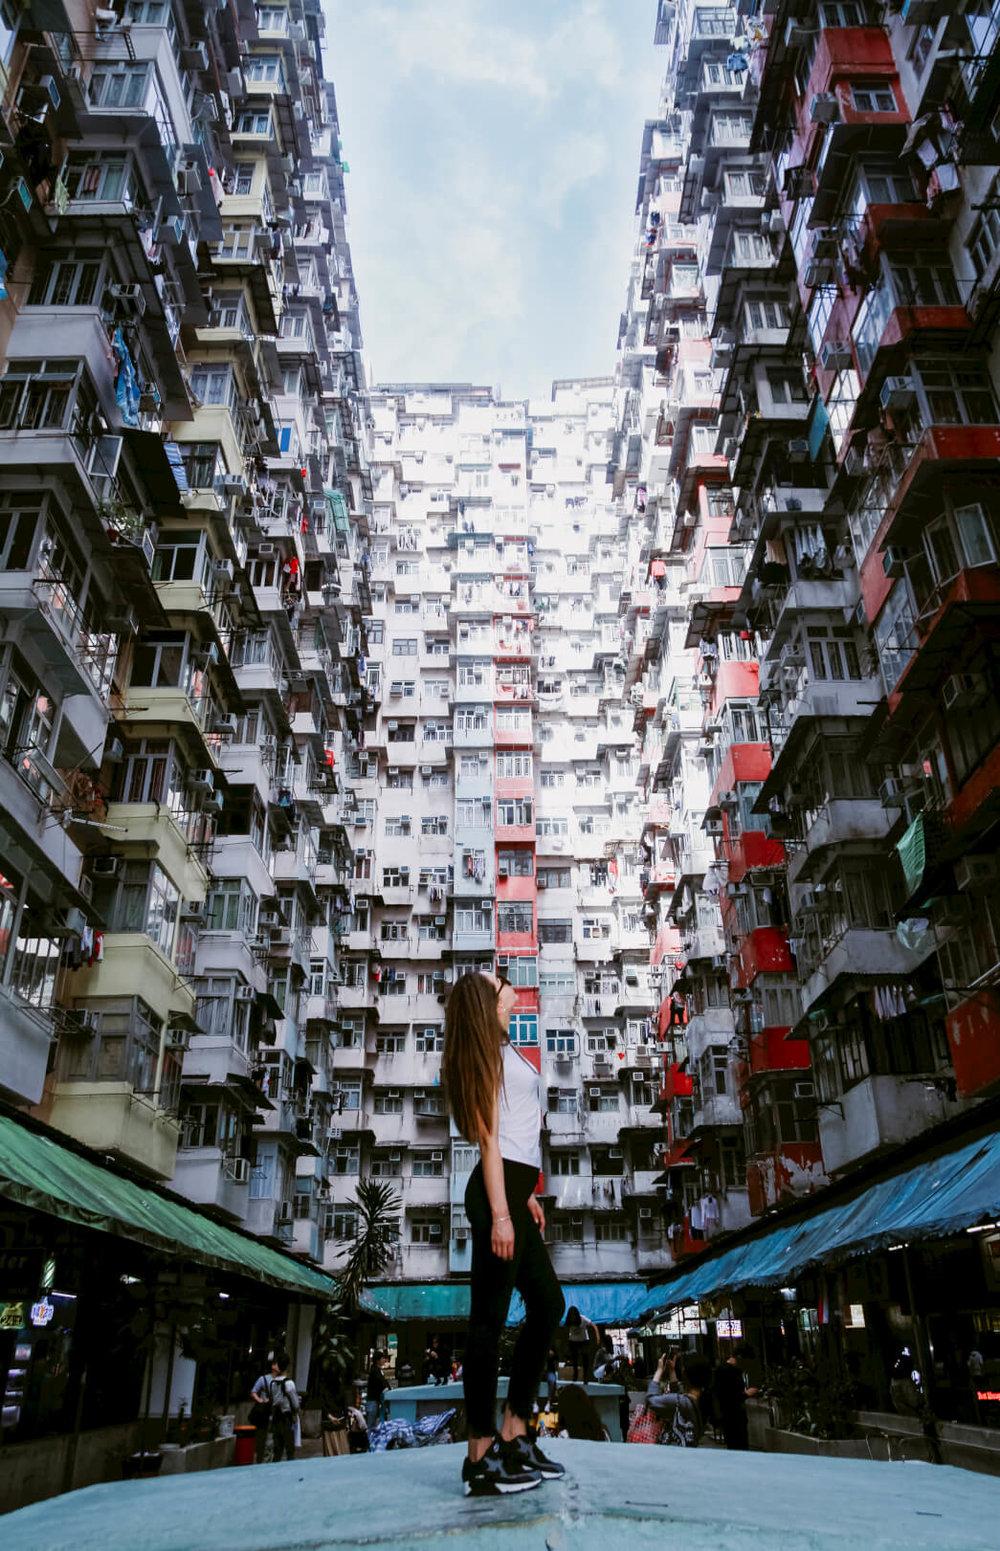 Sprazzi_Professional_Portrait_Photo_Hongkong_Man_Resize_12.jpg